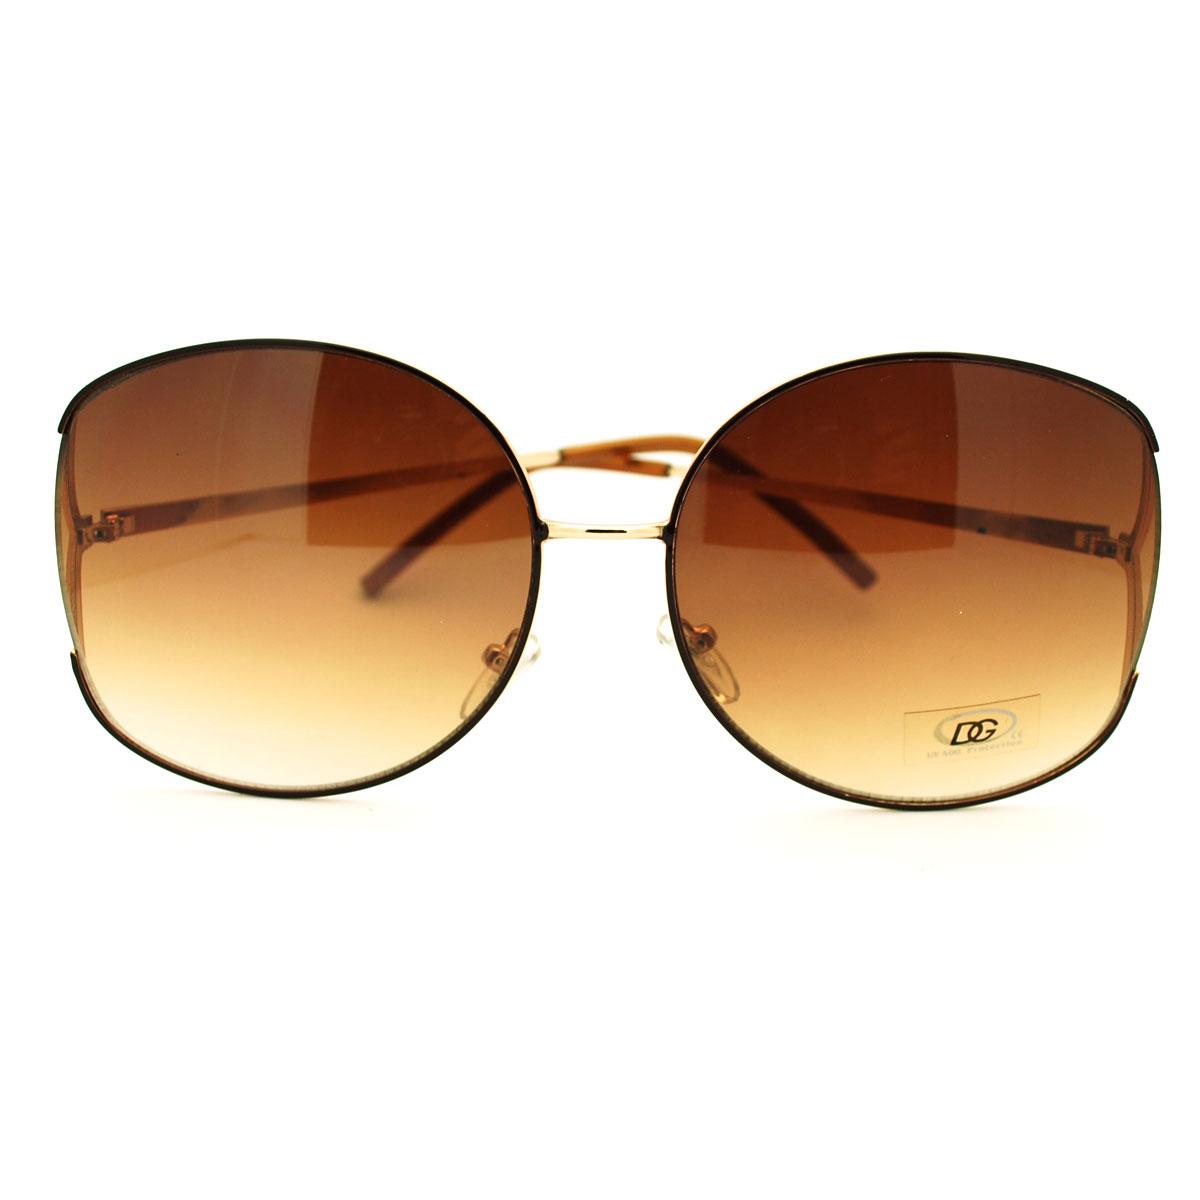 eyewear sunglasses  lens sunglasses